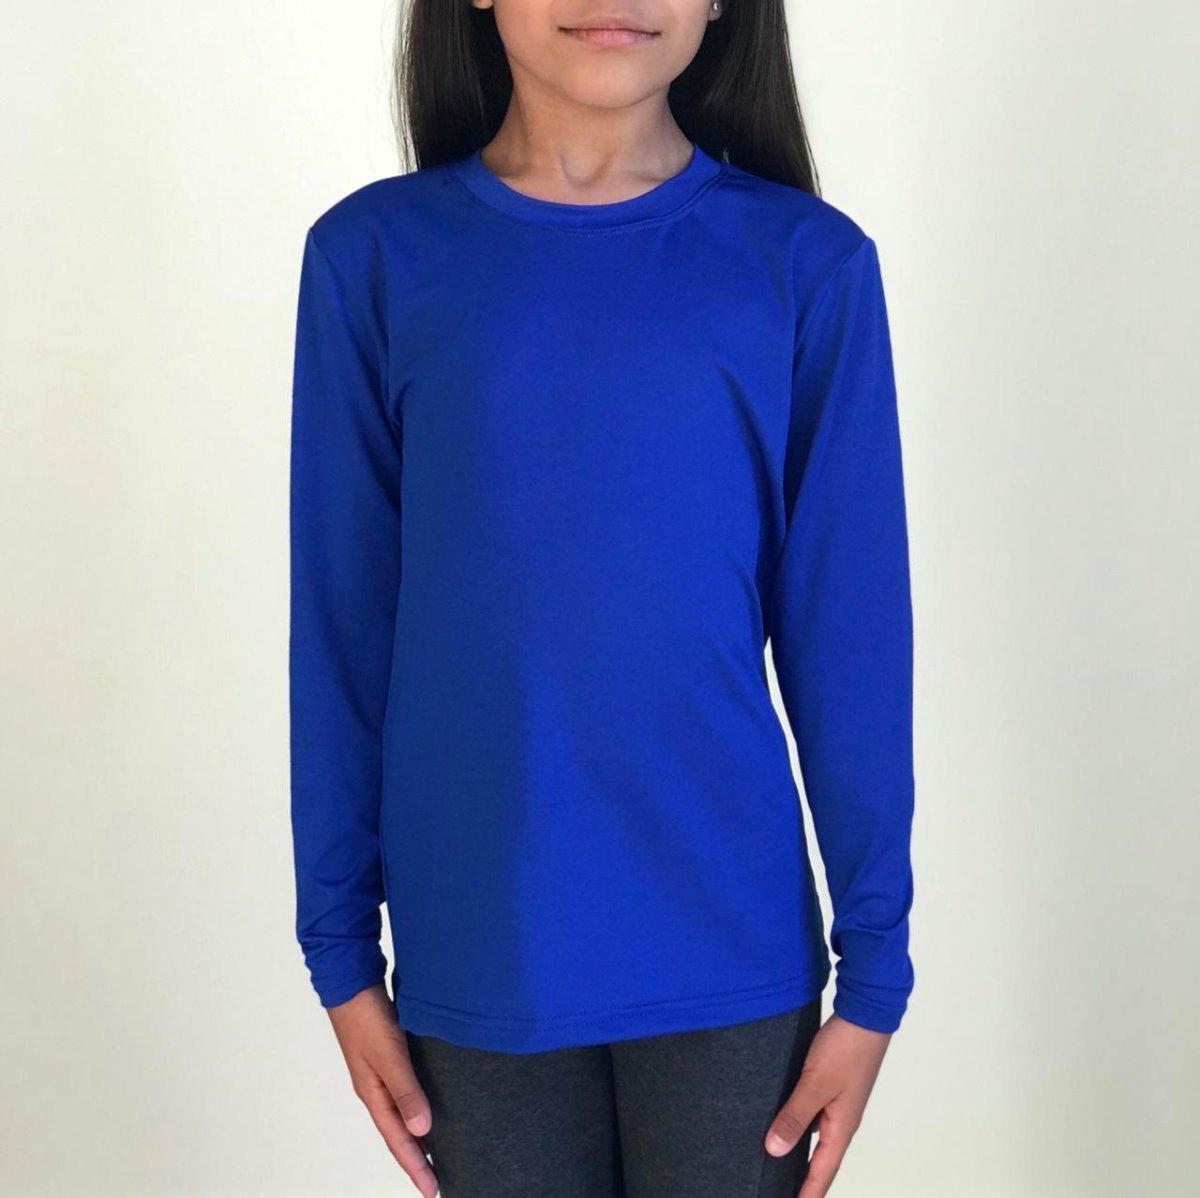 b6249169b5 Camiseta Blusa Camisa Corrida Infantil Transpirar Uv50+ - R  33